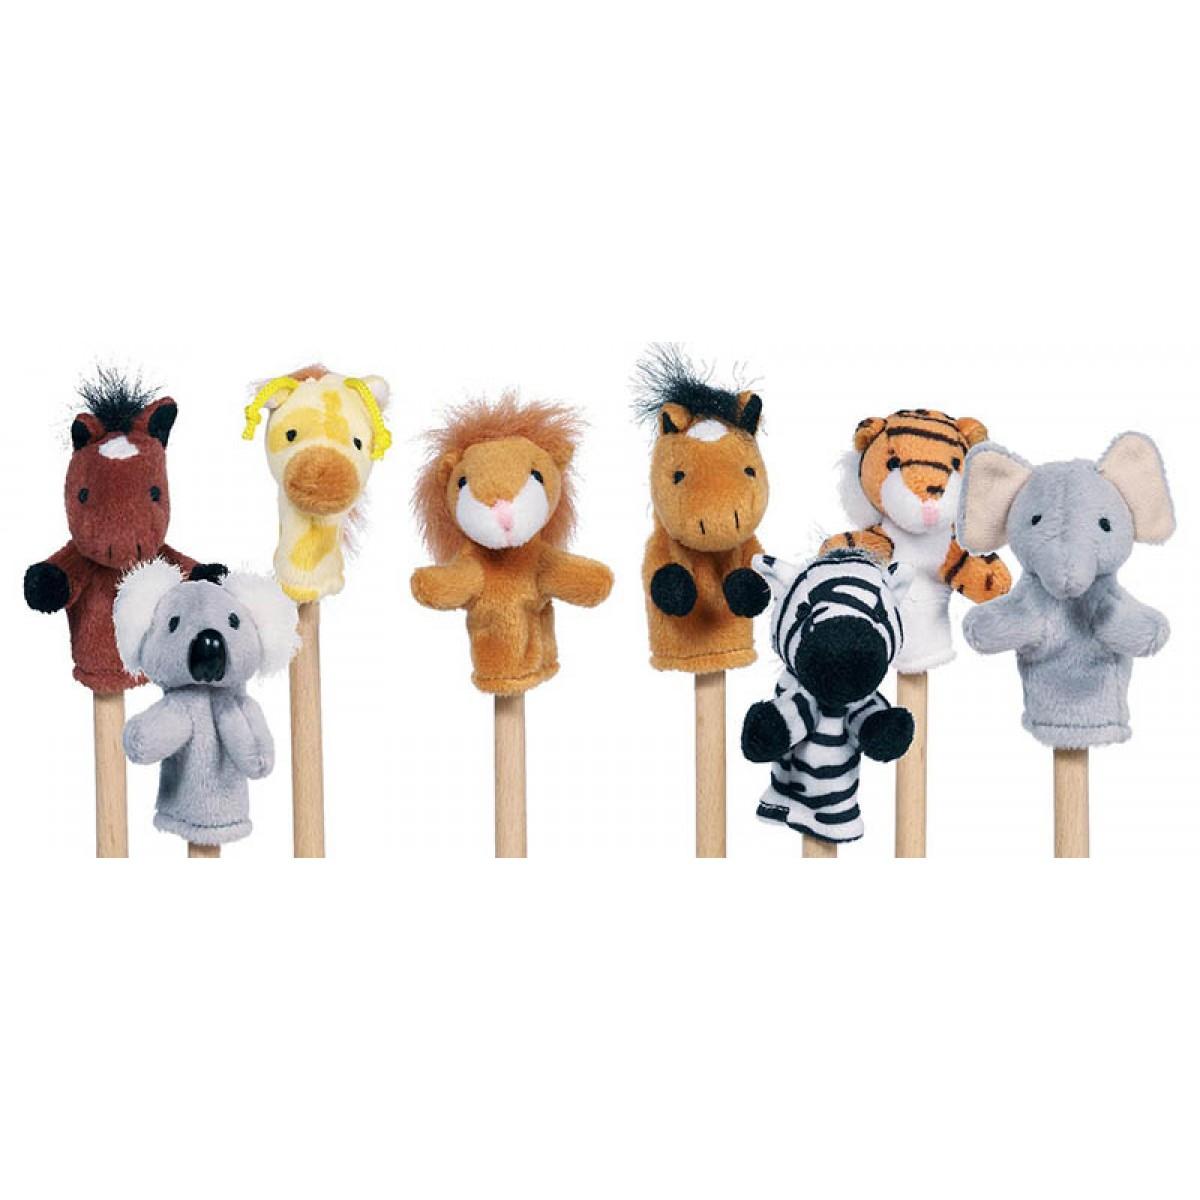 Goki Σετ Δακτυλοφιγούρες Ζώα της Ζούγκλας (8 Τεμ.) Παιχνίδια